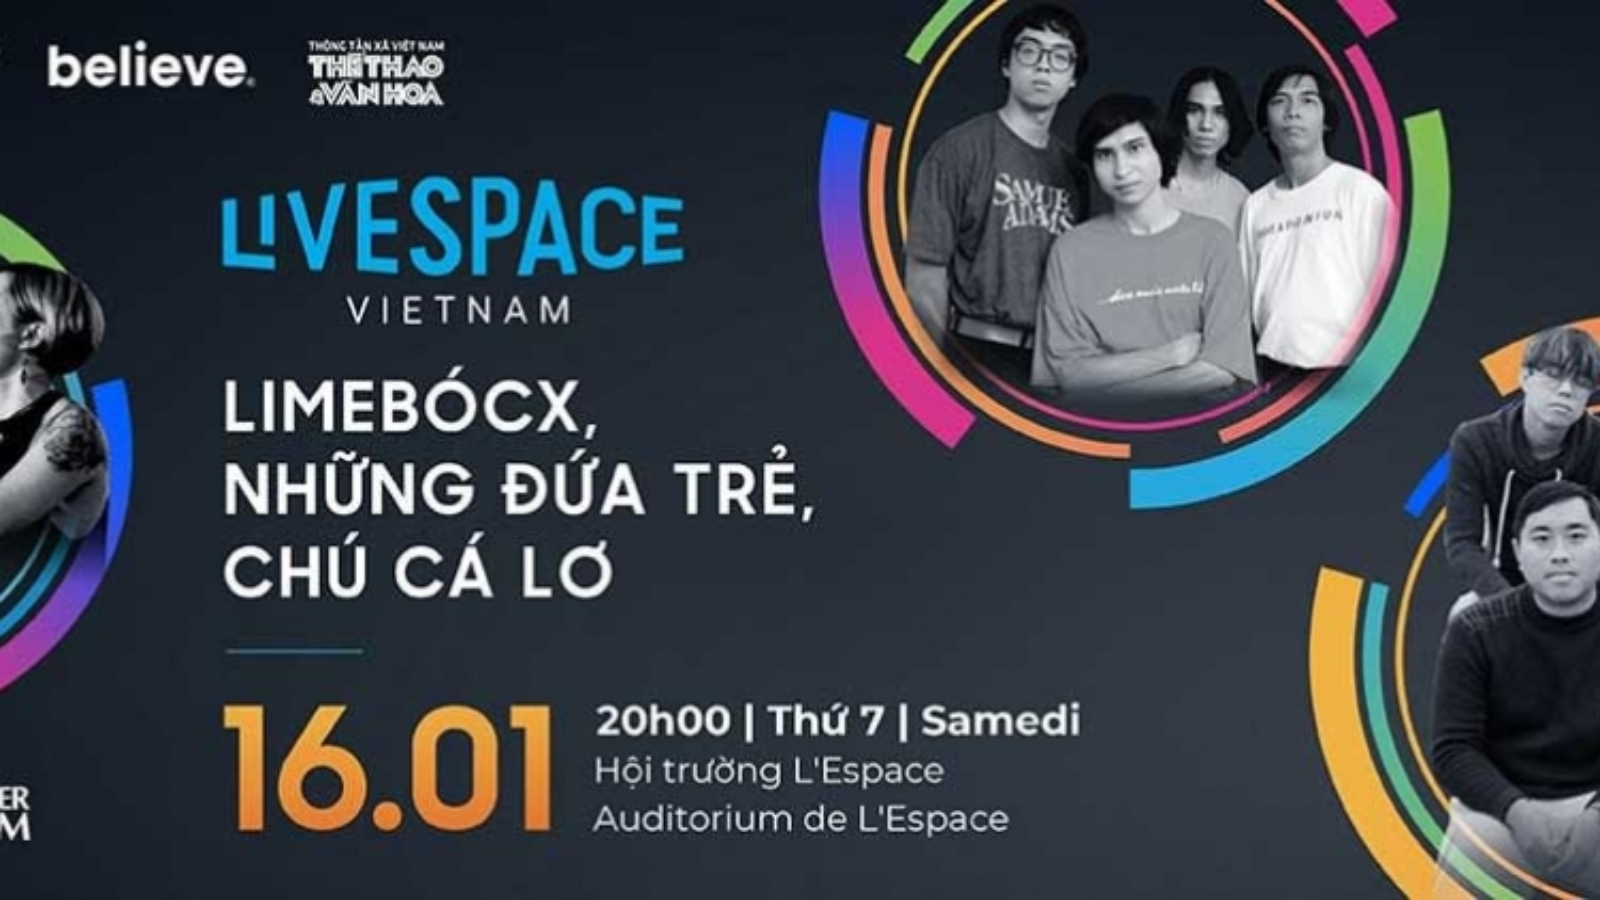 Livespace Vietnam creates new platform for young Vietnamese artists